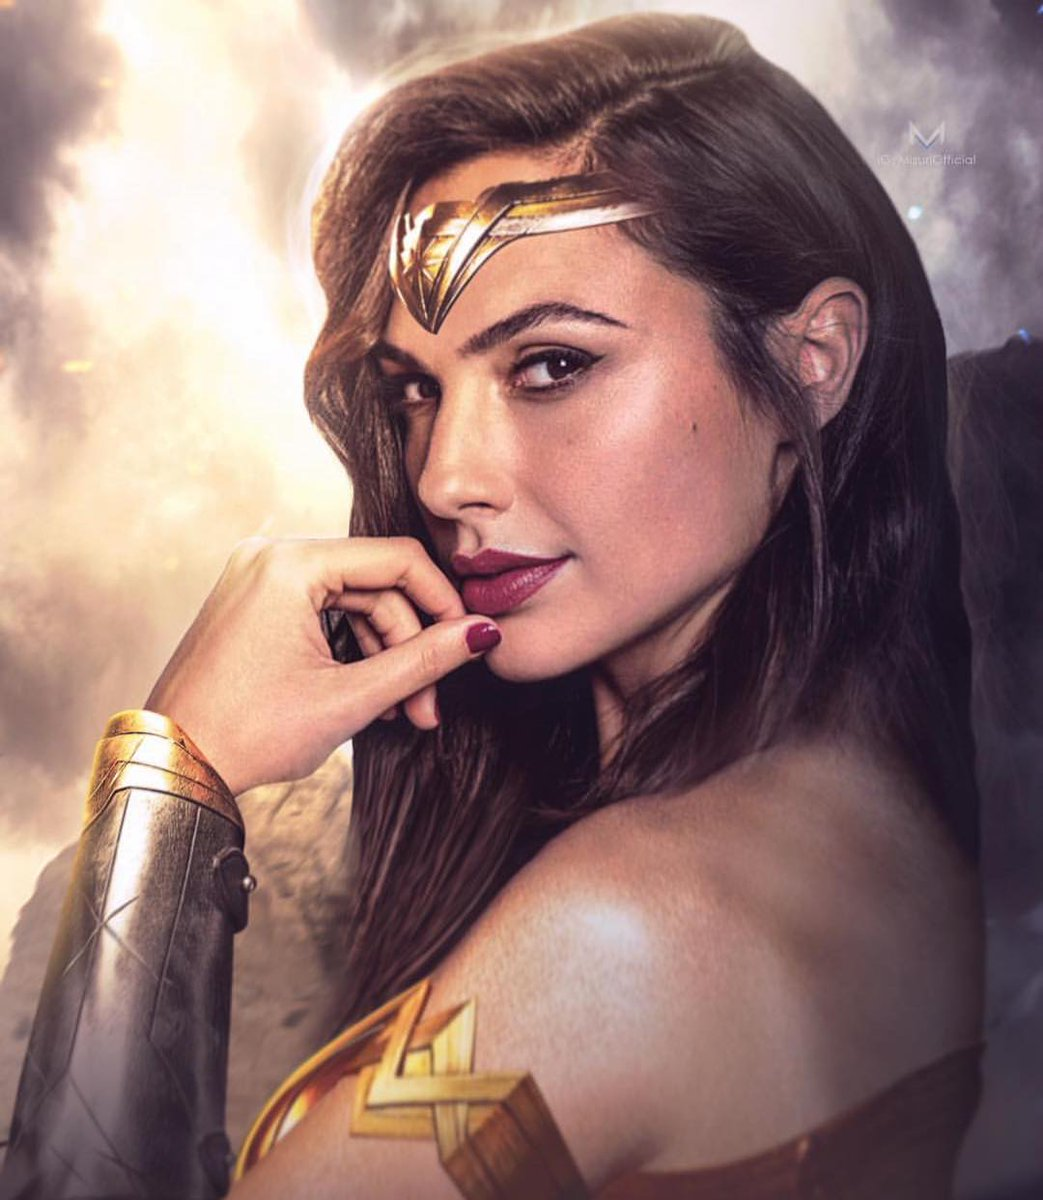 WONDERGAL FAN ART 💋💖👄 #galgadot #revlon #WonderWoman #DCEU #DCComics #FemaleLead #ComicBookMovies #Film #Movies #FanArt #Shazam #Aquaman #RevlonGalGadot #FanEdit #Artist #muzurioofficial #WCE #womencrusheveryday #israel #Model #WW84 #SundayThoughts #SundayFunday #Weekend #Art